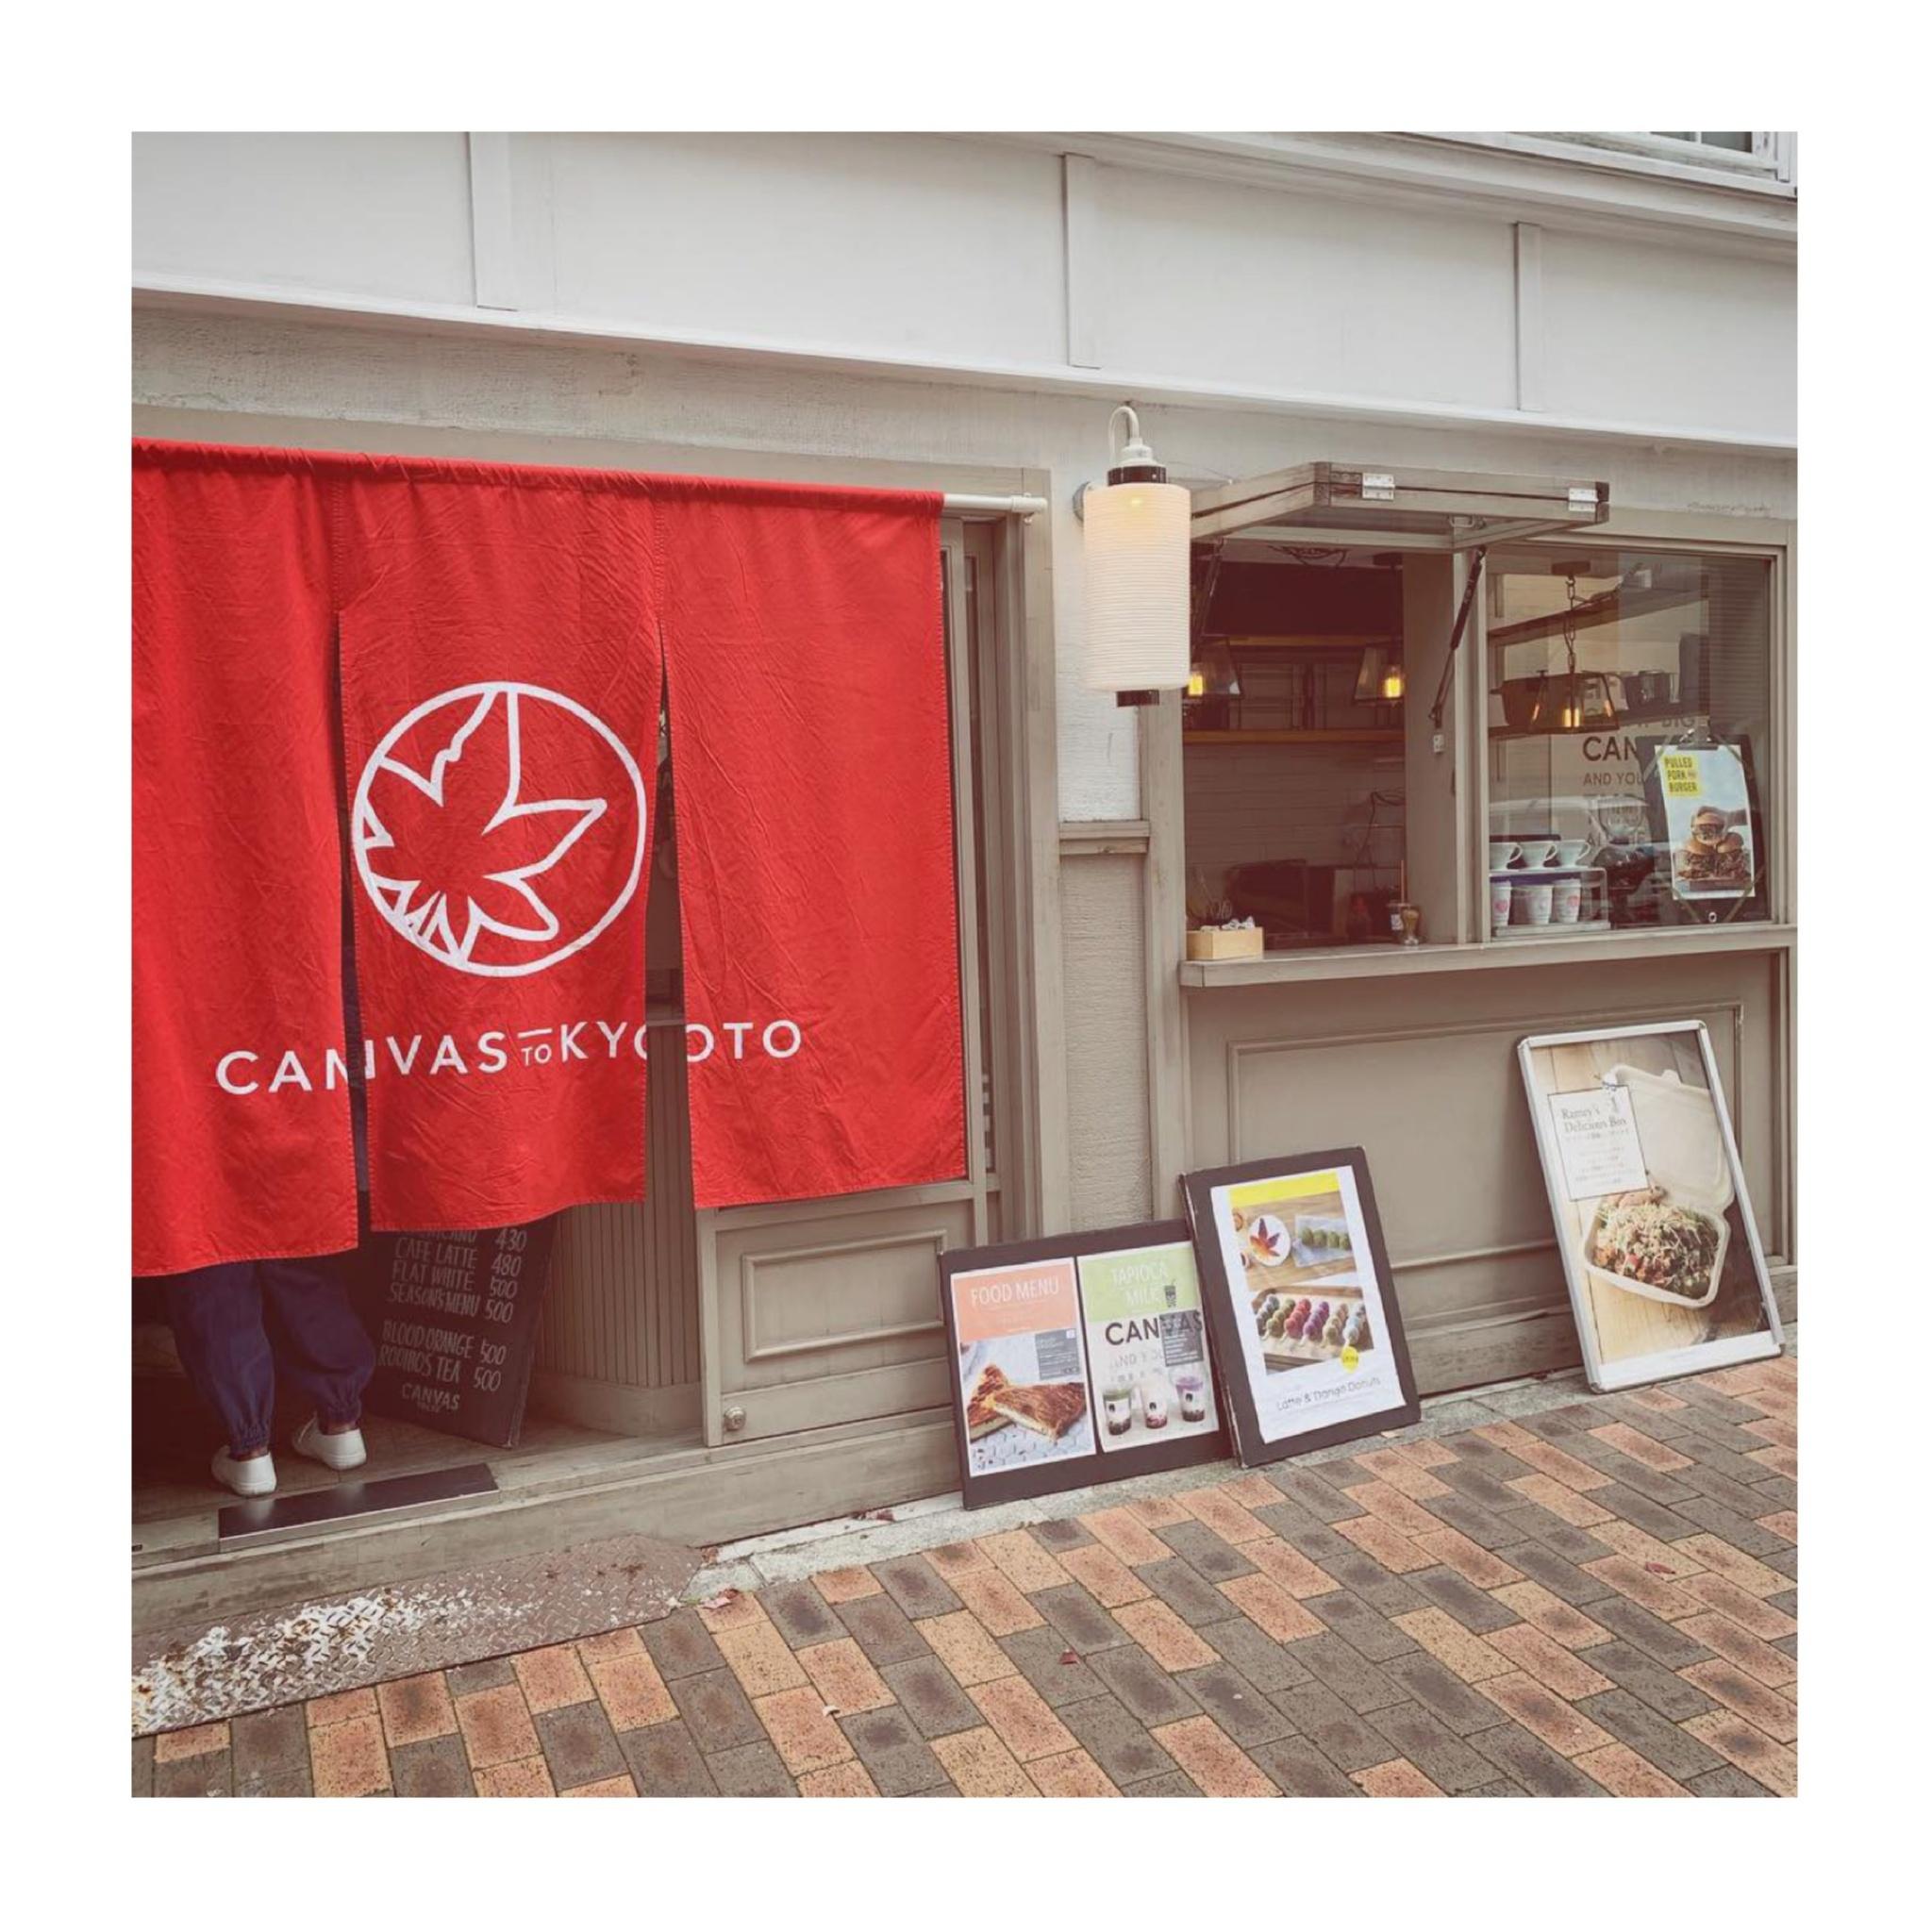 #19【#cafestagram】❤️:《東京•広尾》〜11/25まで期間限定!大人気カフェ『CANVAS TOKYO』で飲める紅葉のカラーラテをチェック☻_2